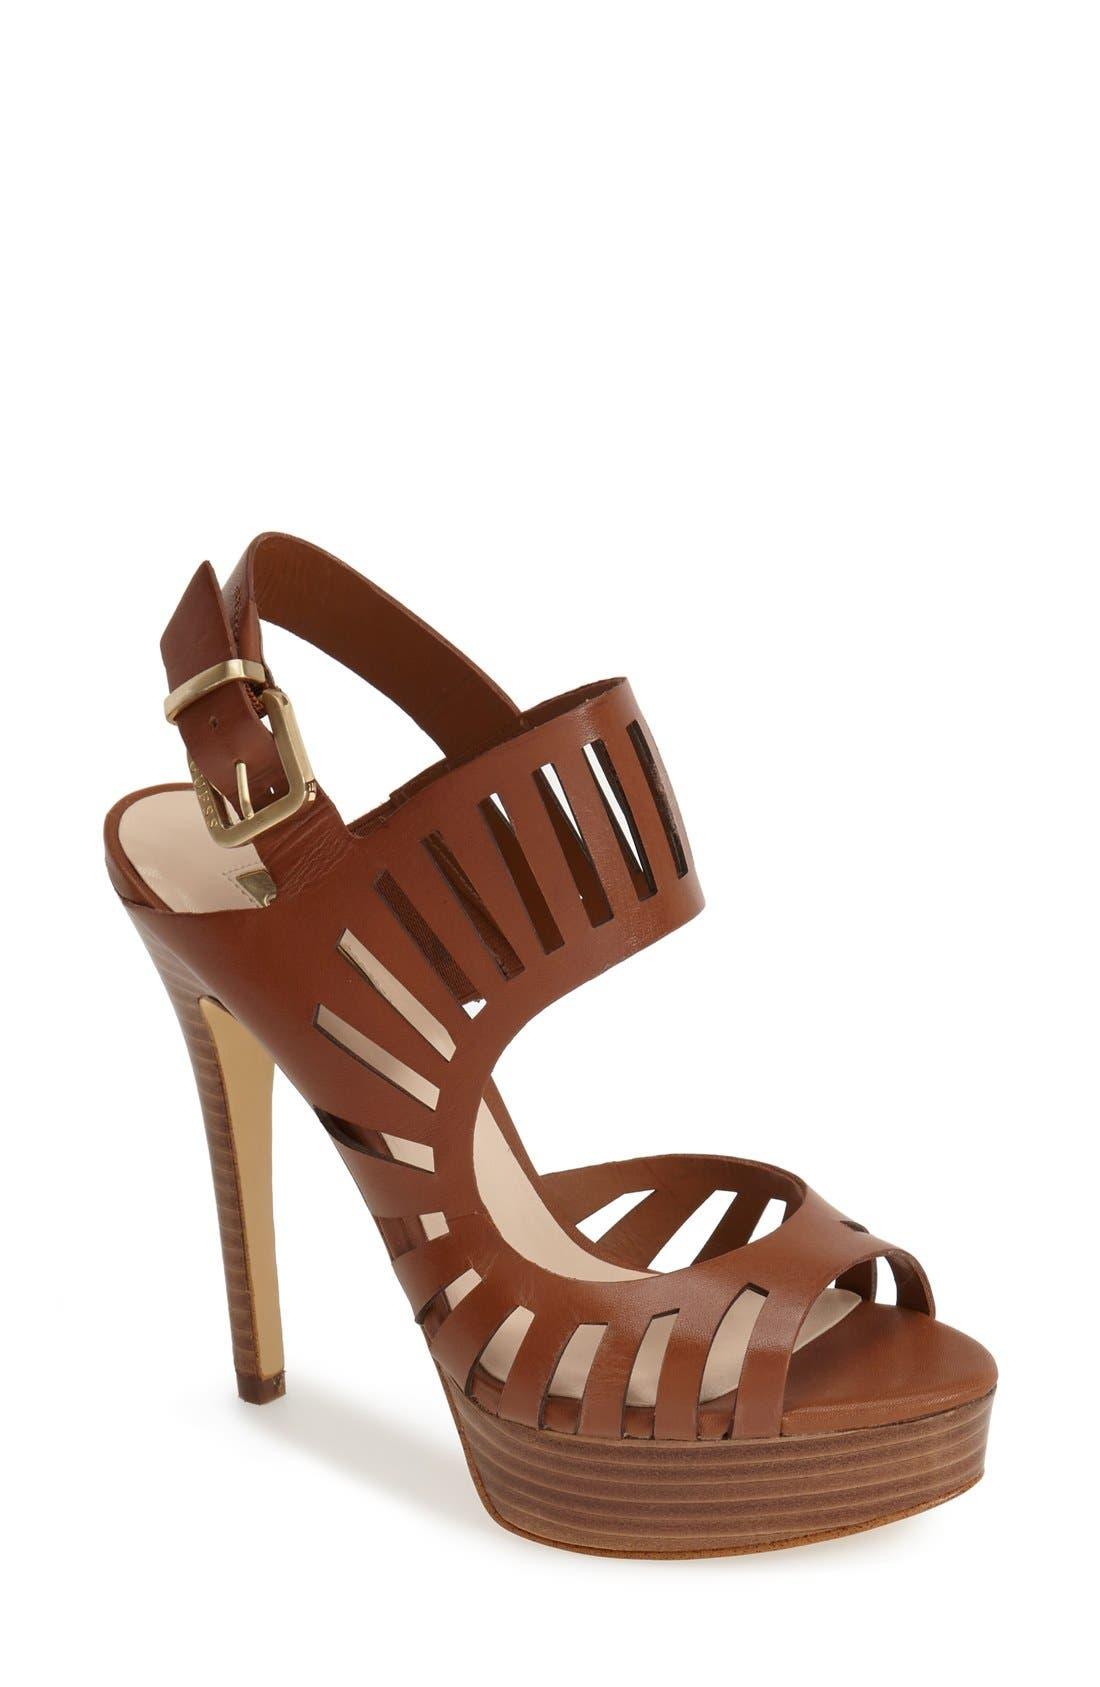 Main Image - GUESS 'Kabirra' Cutout Leather Platform Sandal (Women)